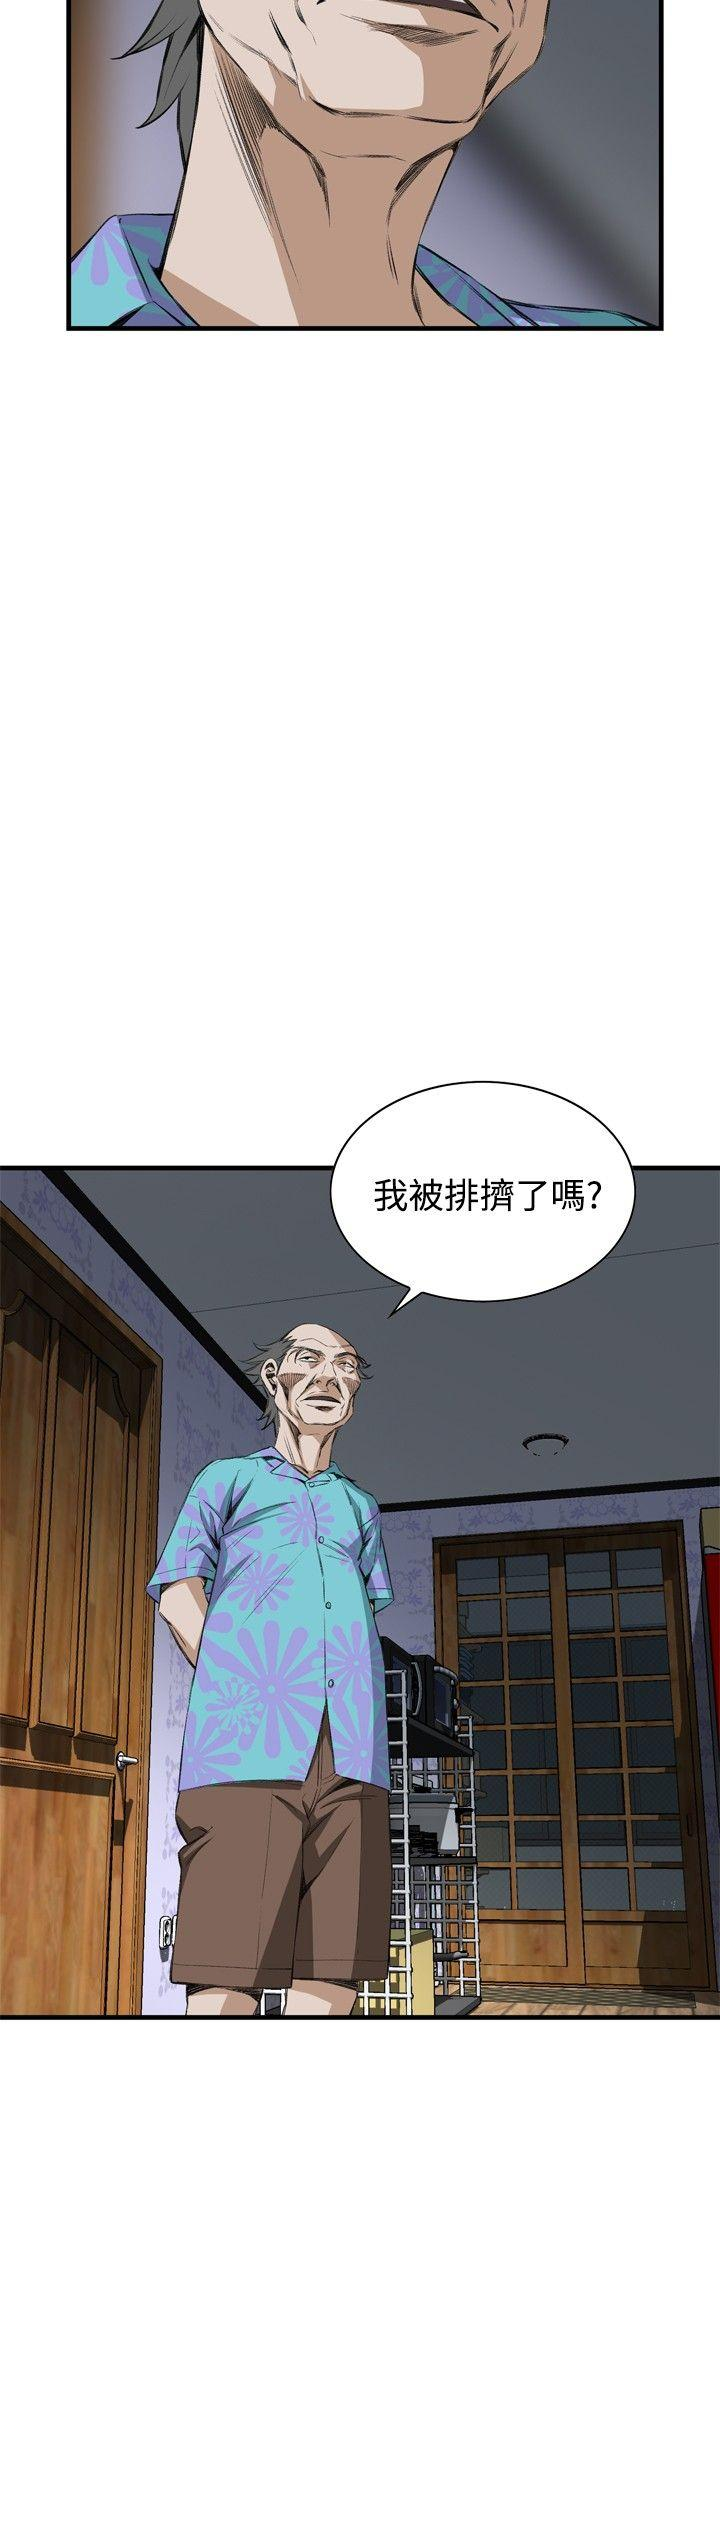 Take a Peek 偷窥 Ch.39~60 [Chinese]中文 512